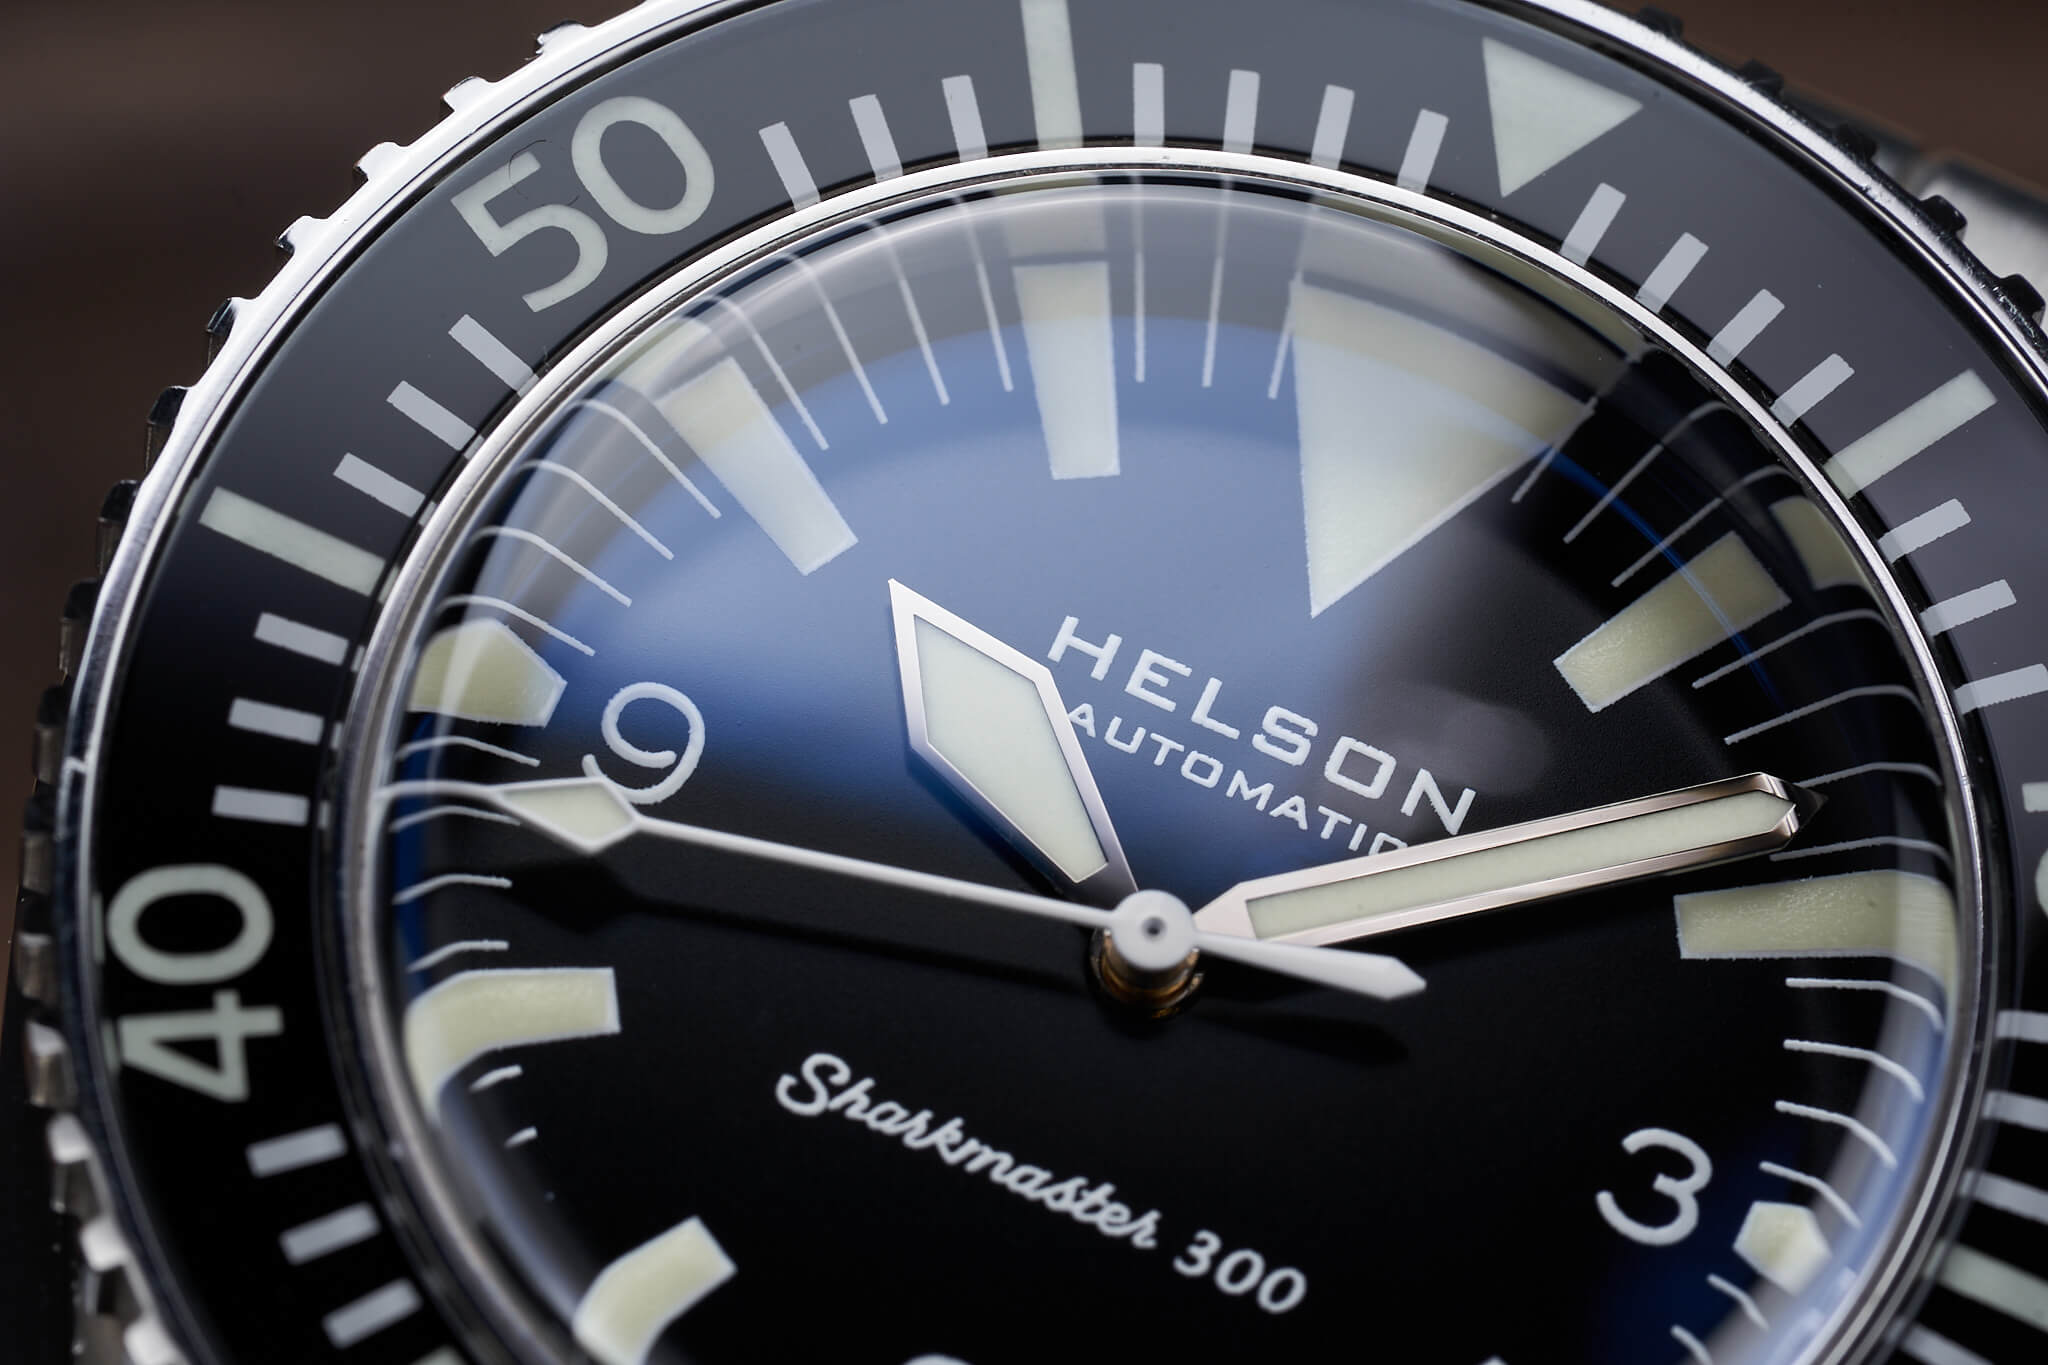 helson-sharkmaster-12